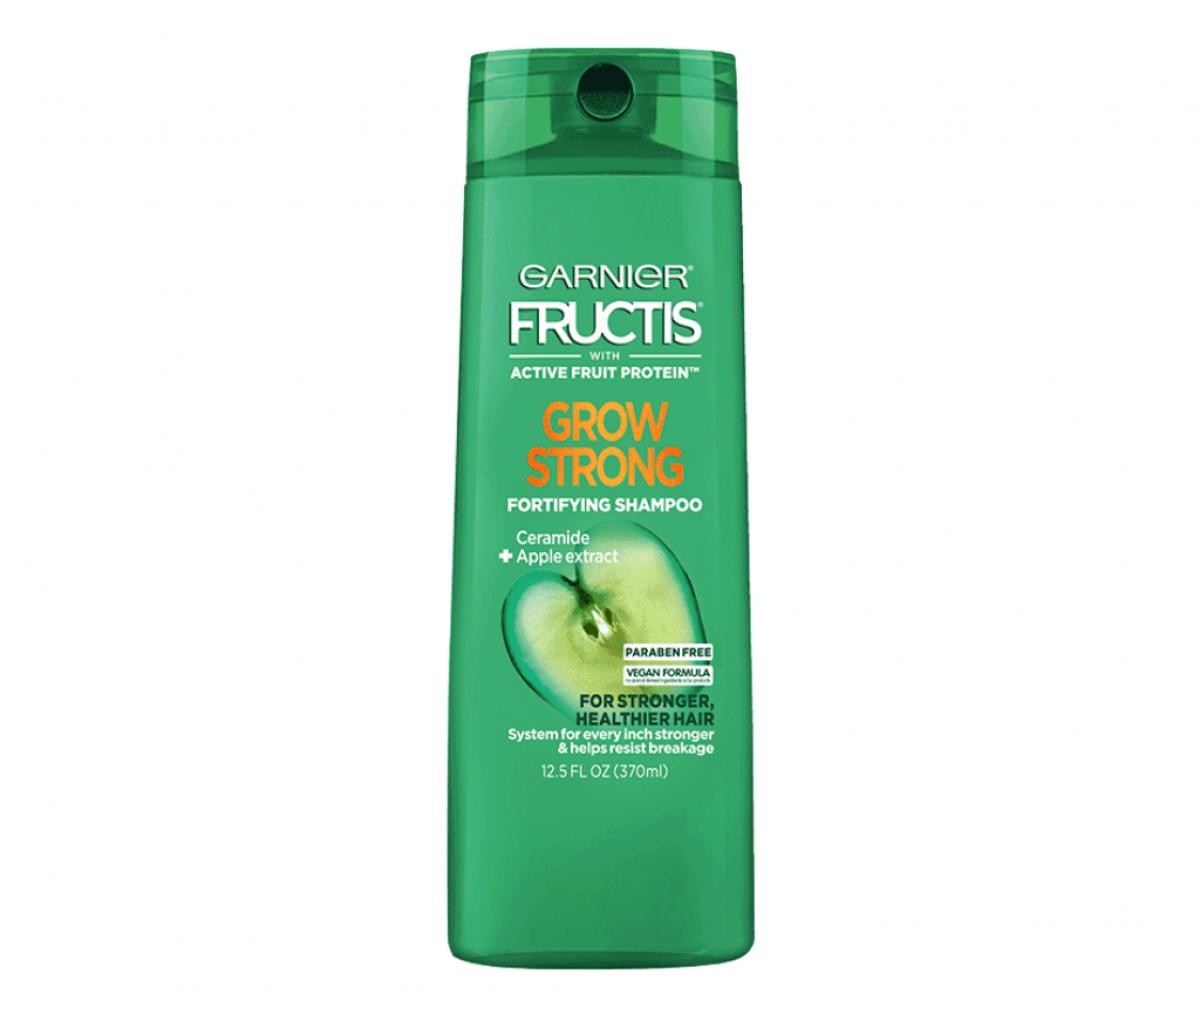 Garnier 400ml Fructis Grow Strong (old-1117) Shampoo